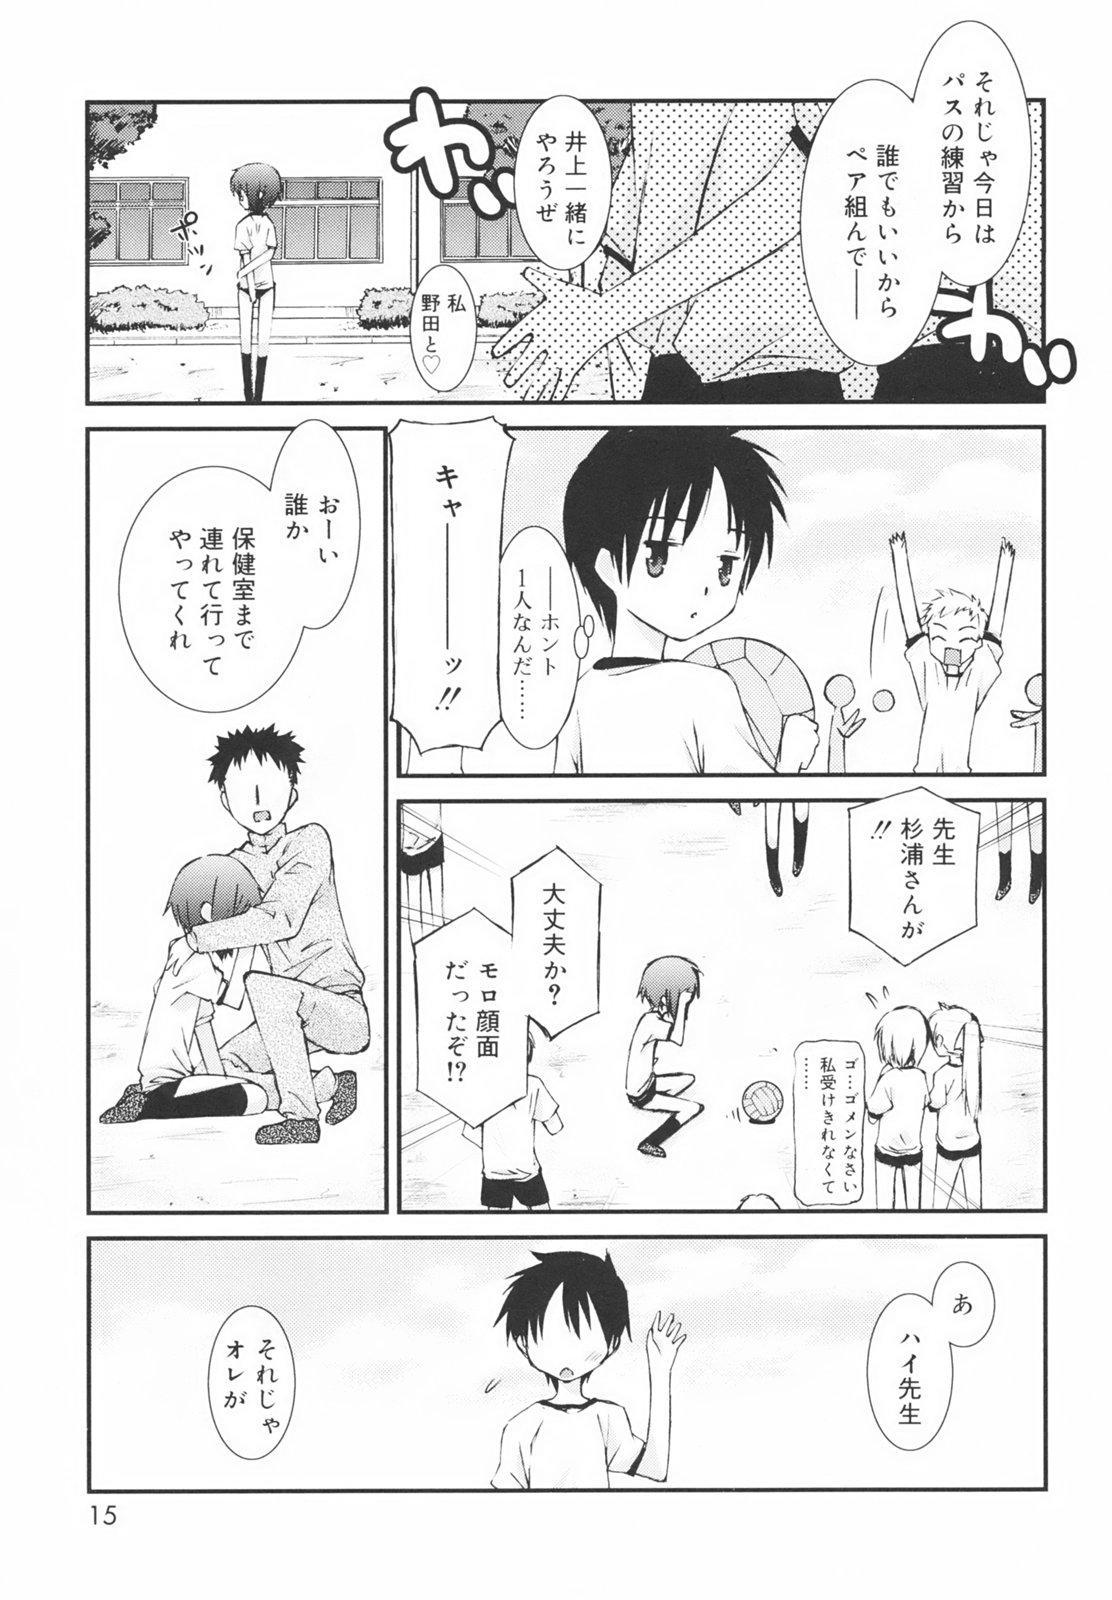 Gakkou No Nai Hi - A Day without School 18